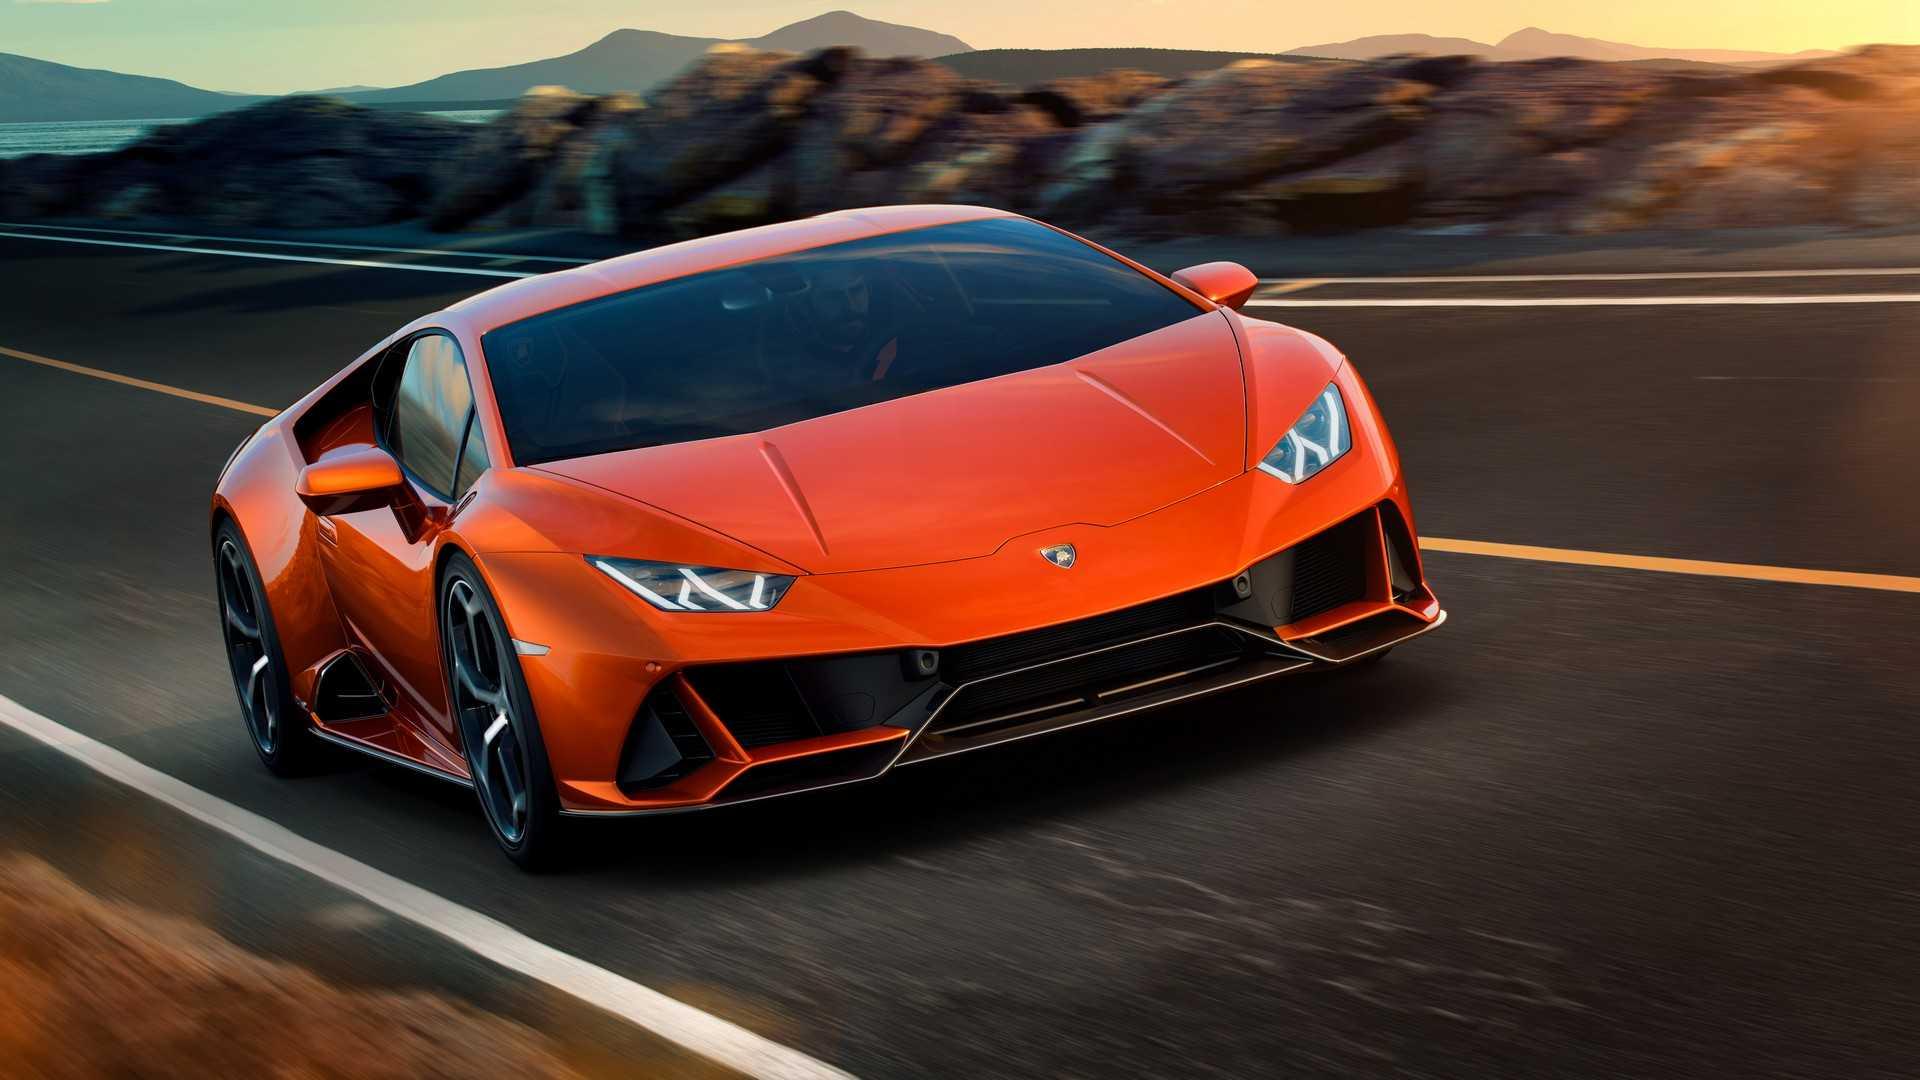 Представлен обновленный суперкар Lamborghini Huracan Evo